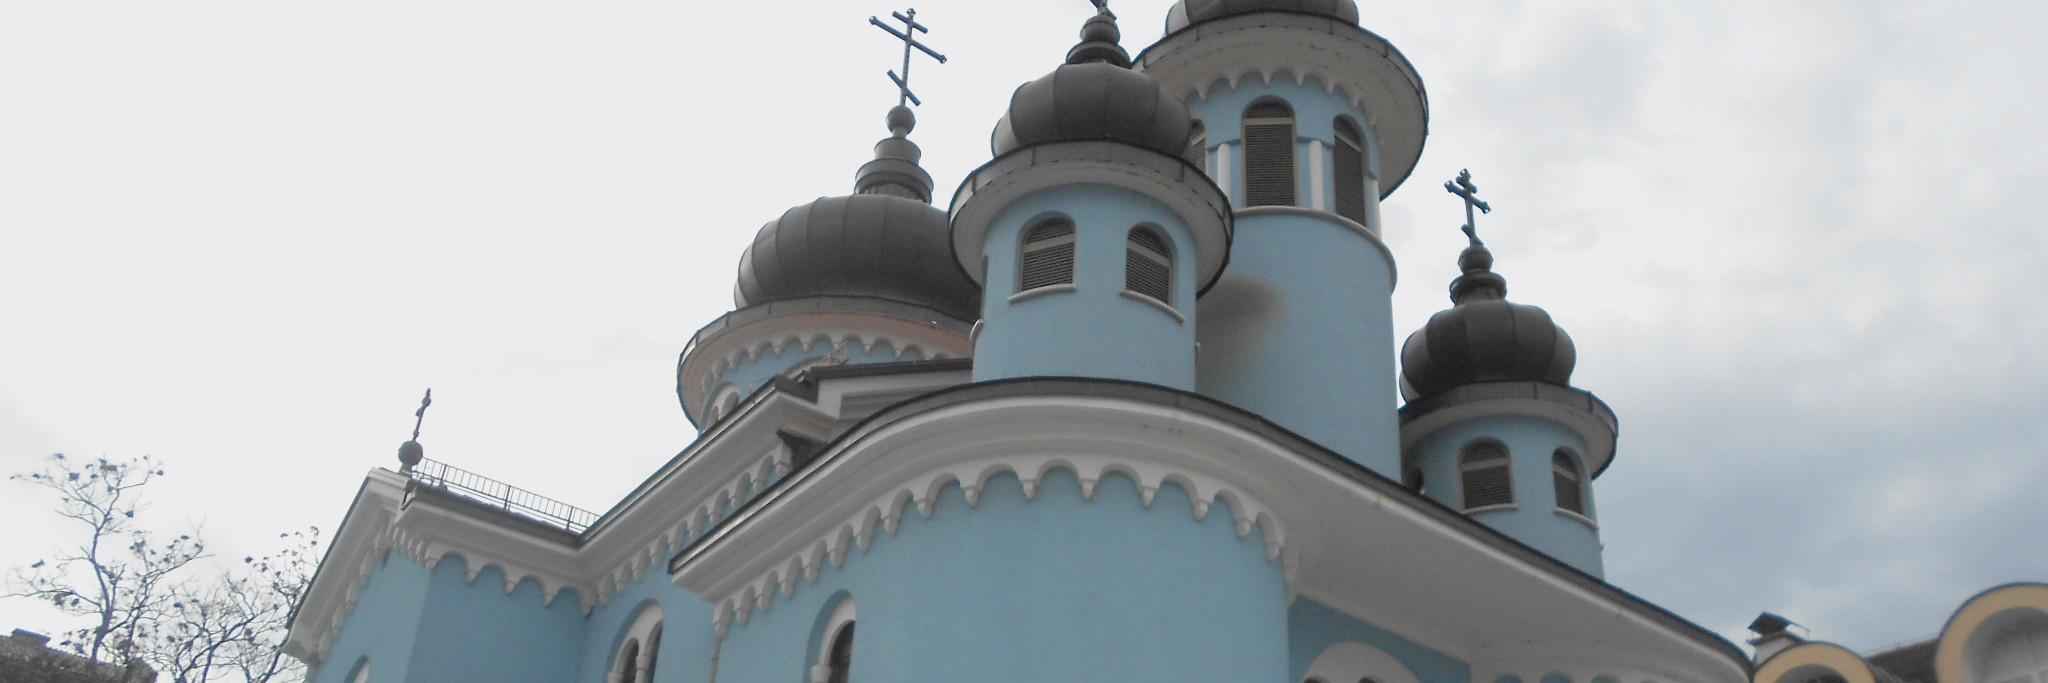 Украинская церковь Христа Царя